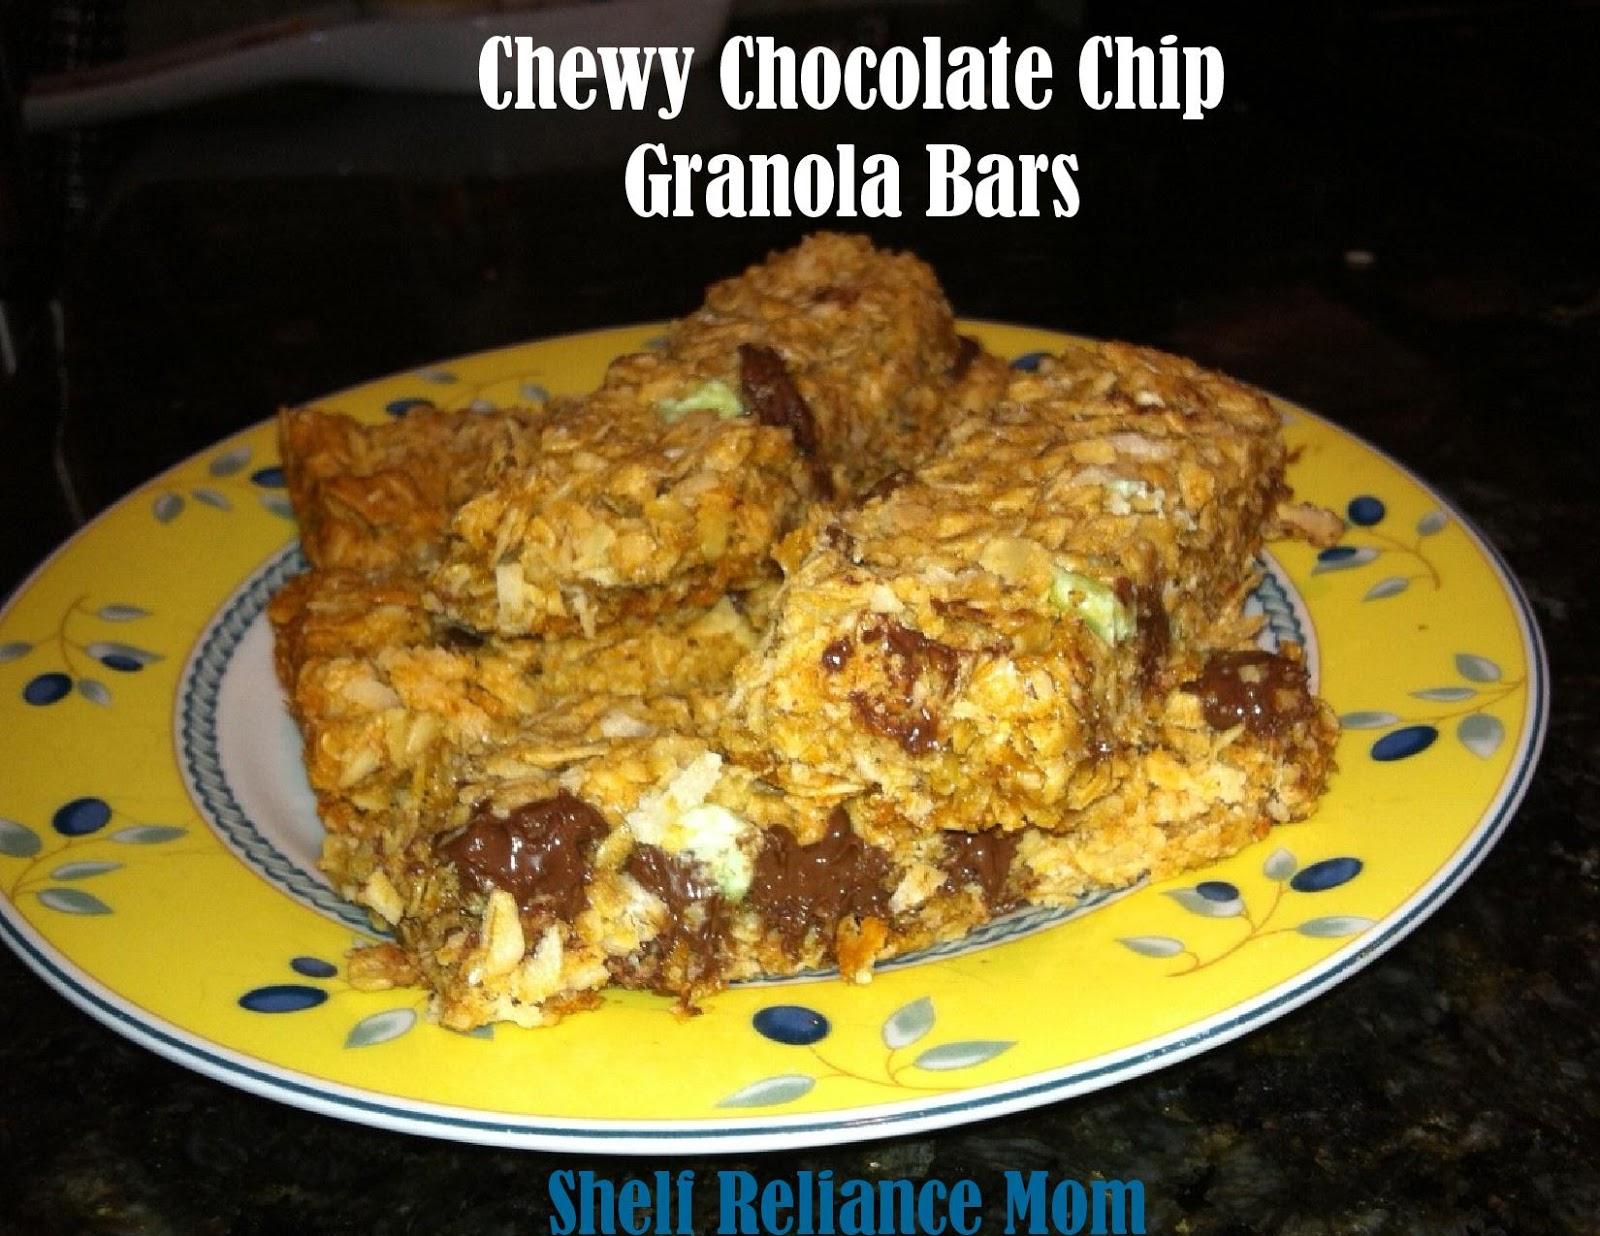 Shelf Reliance Mom: Chewy Chocolate Chip Granola Bars